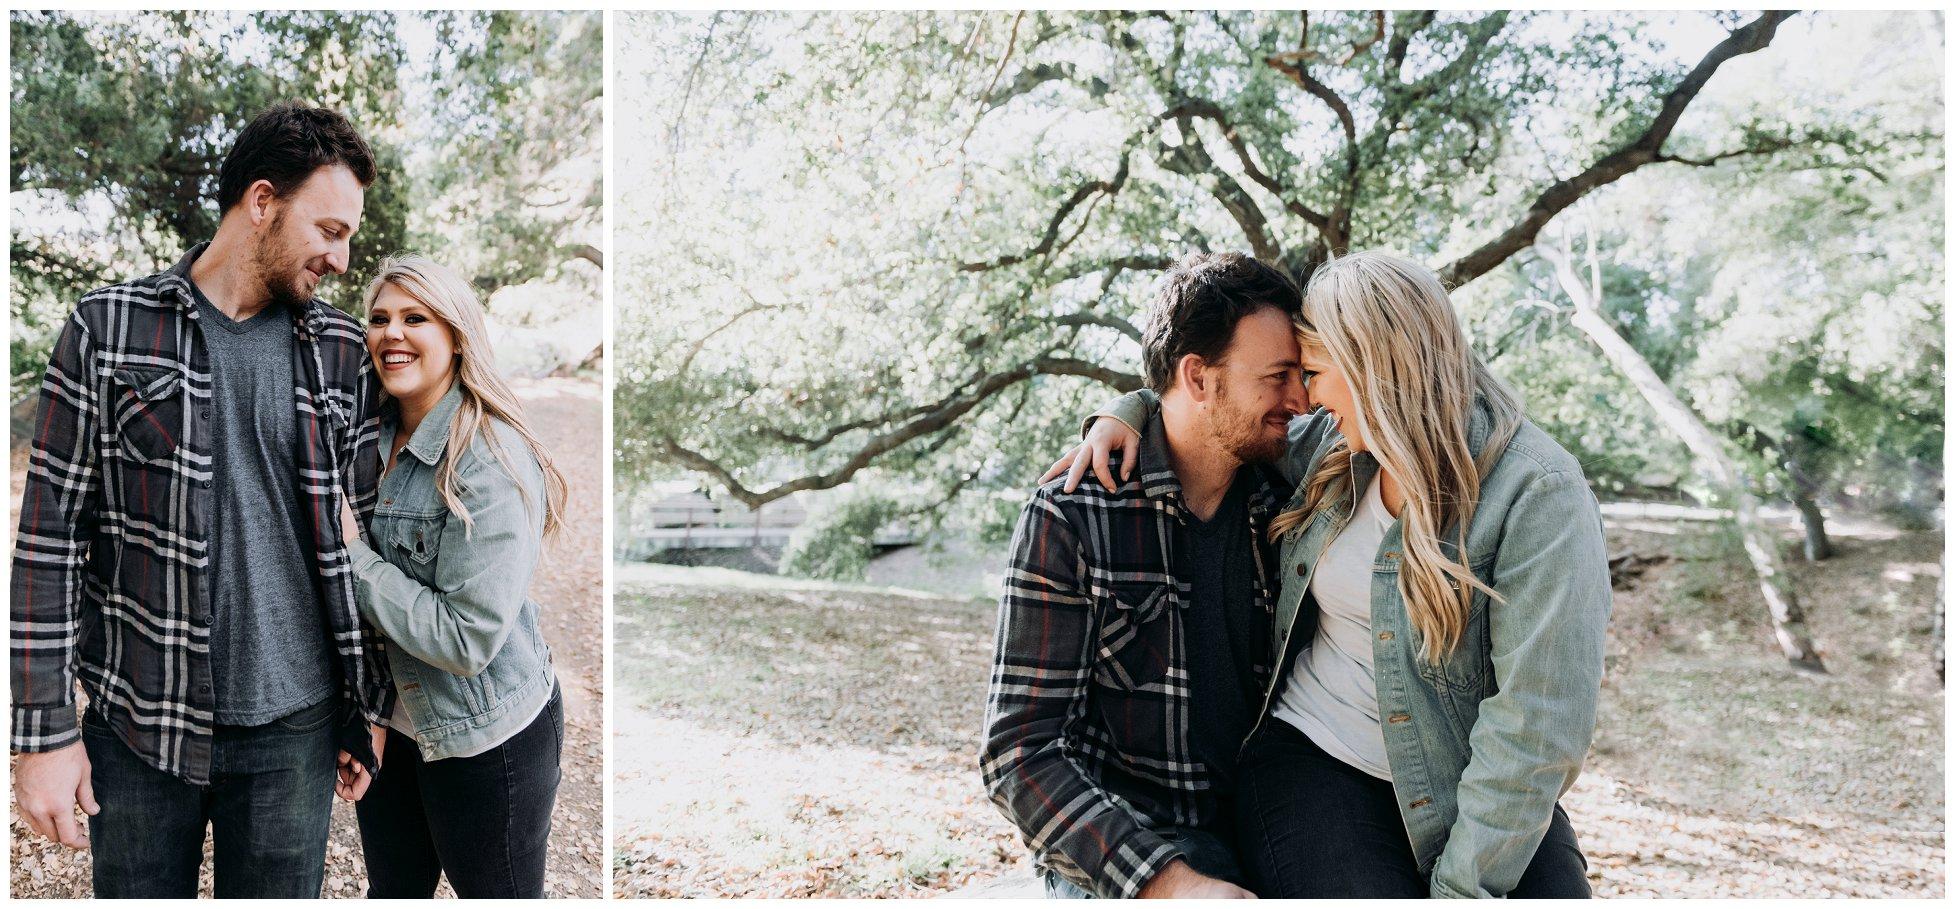 Chevy Bel Air | Flinn Springs Engagement Photography | San Diego